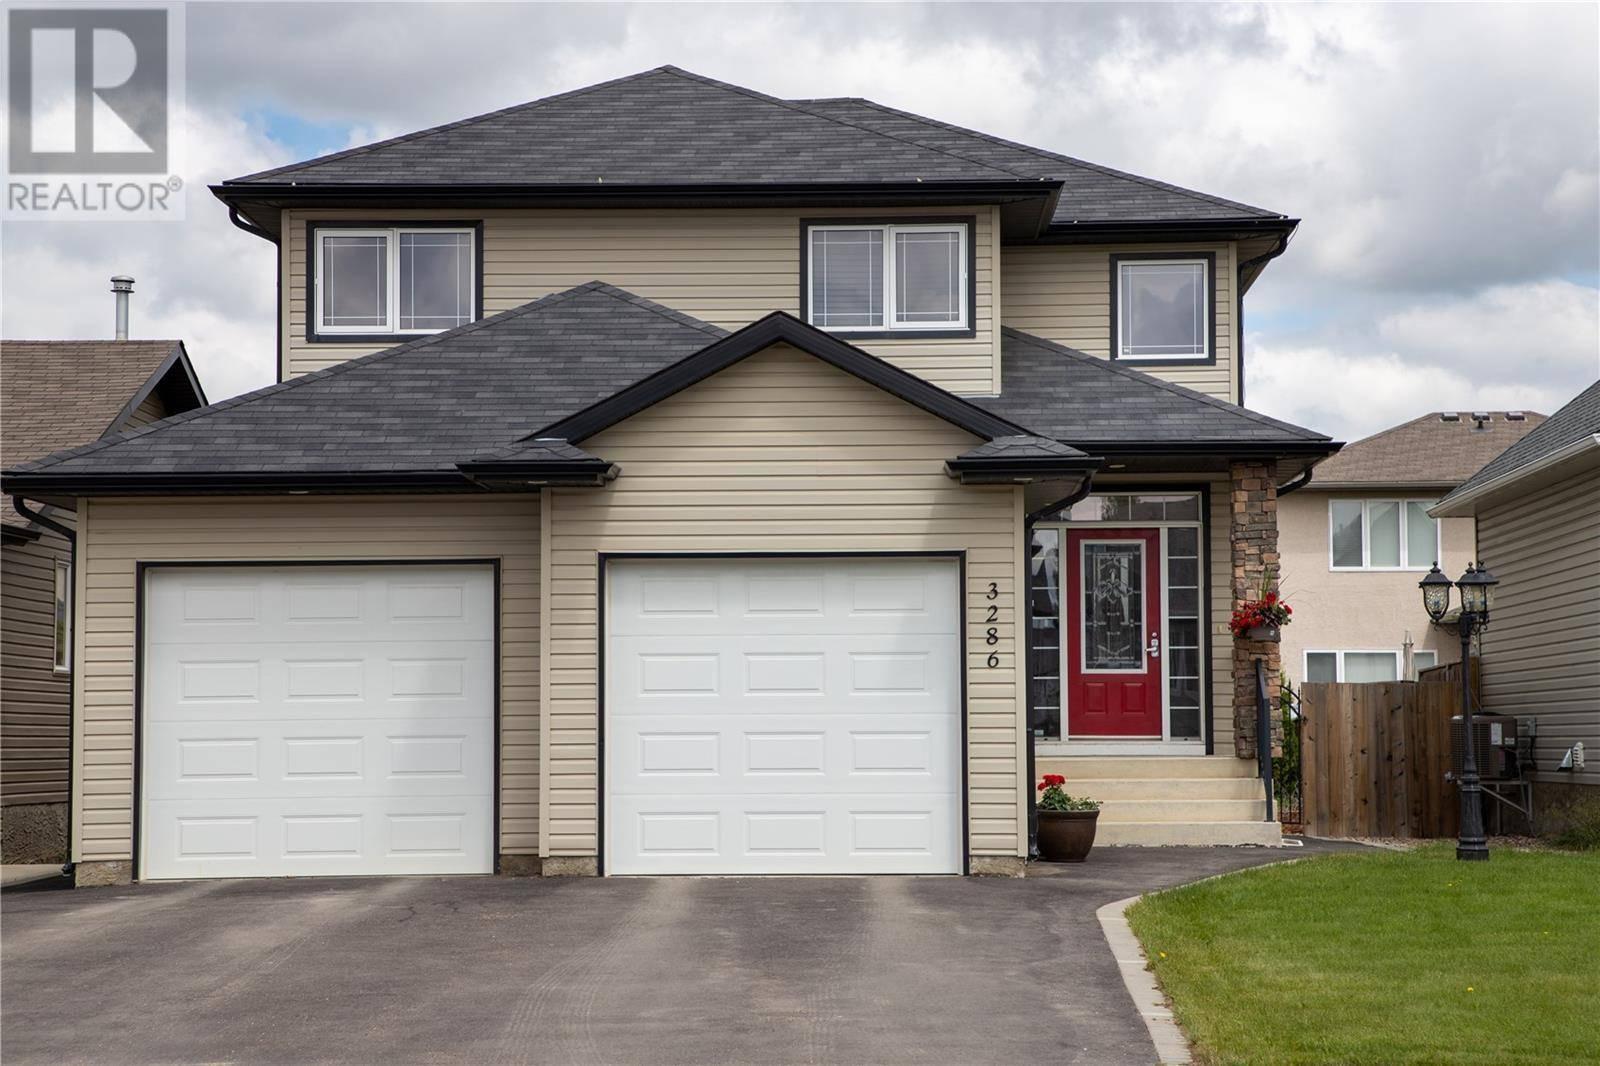 House for sale at 3286 Mcclocklin Rd Saskatoon Saskatchewan - MLS: SK777449